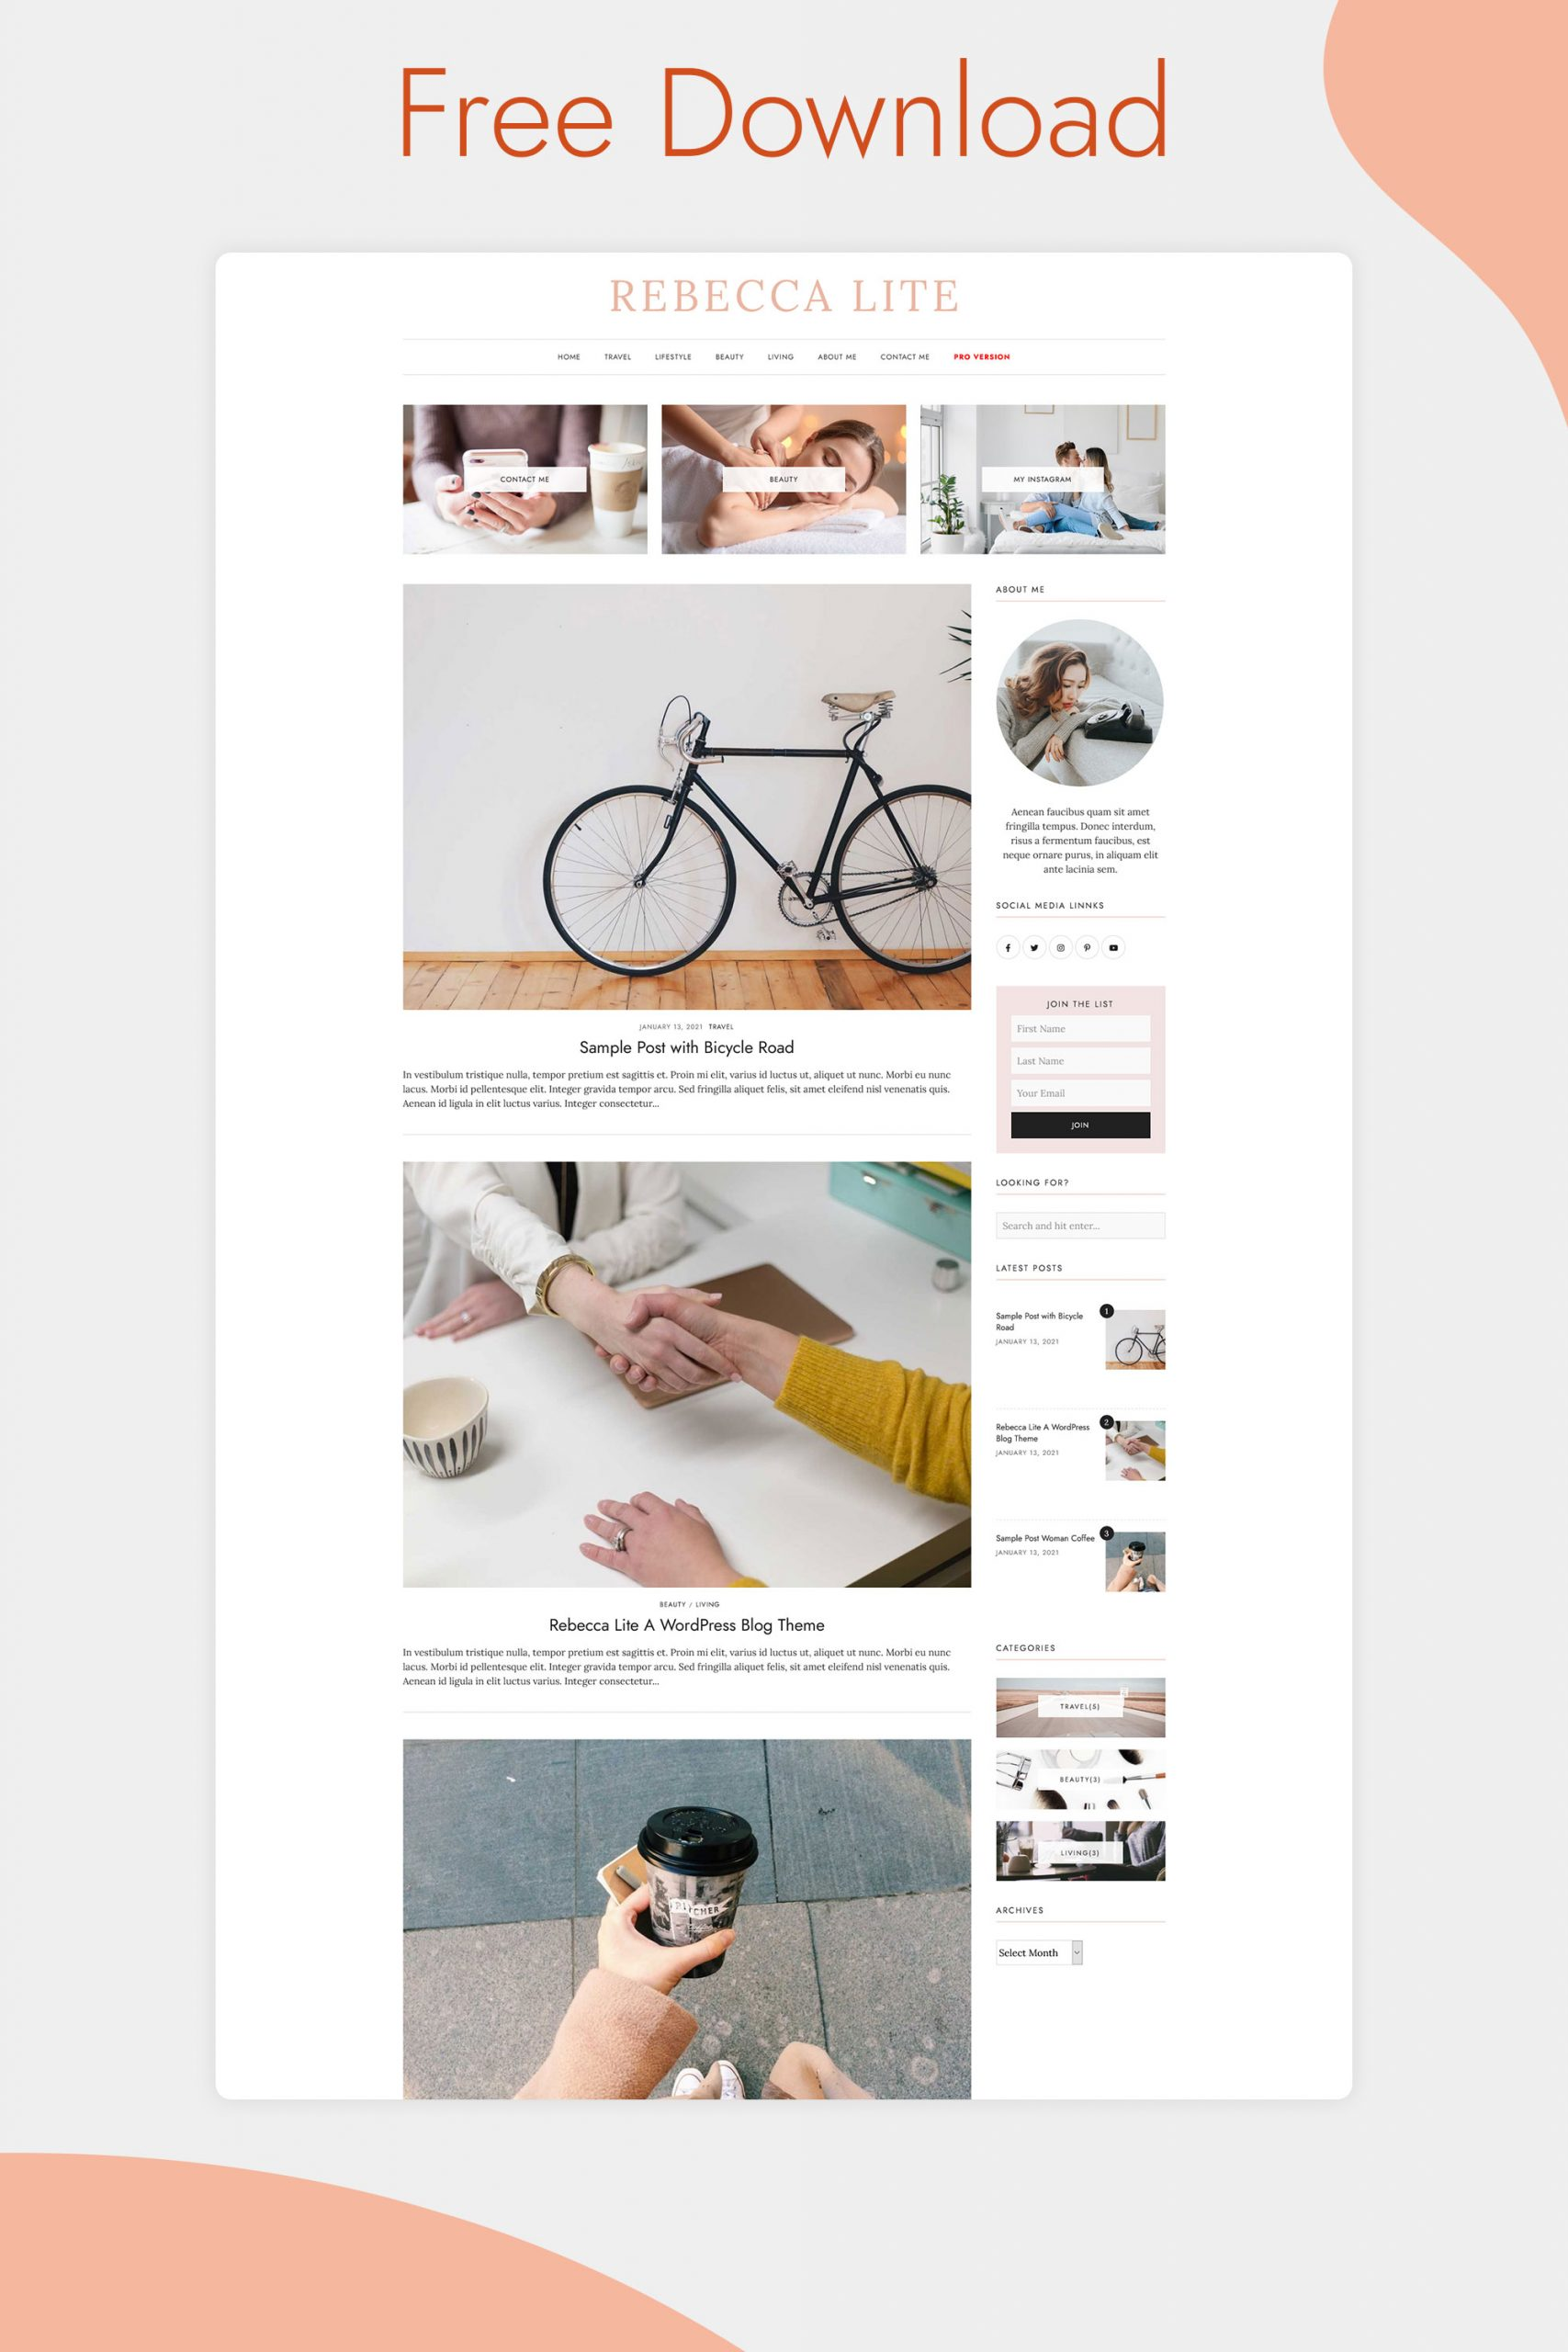 Rebecca Lite - Free WordPress Blog Theme